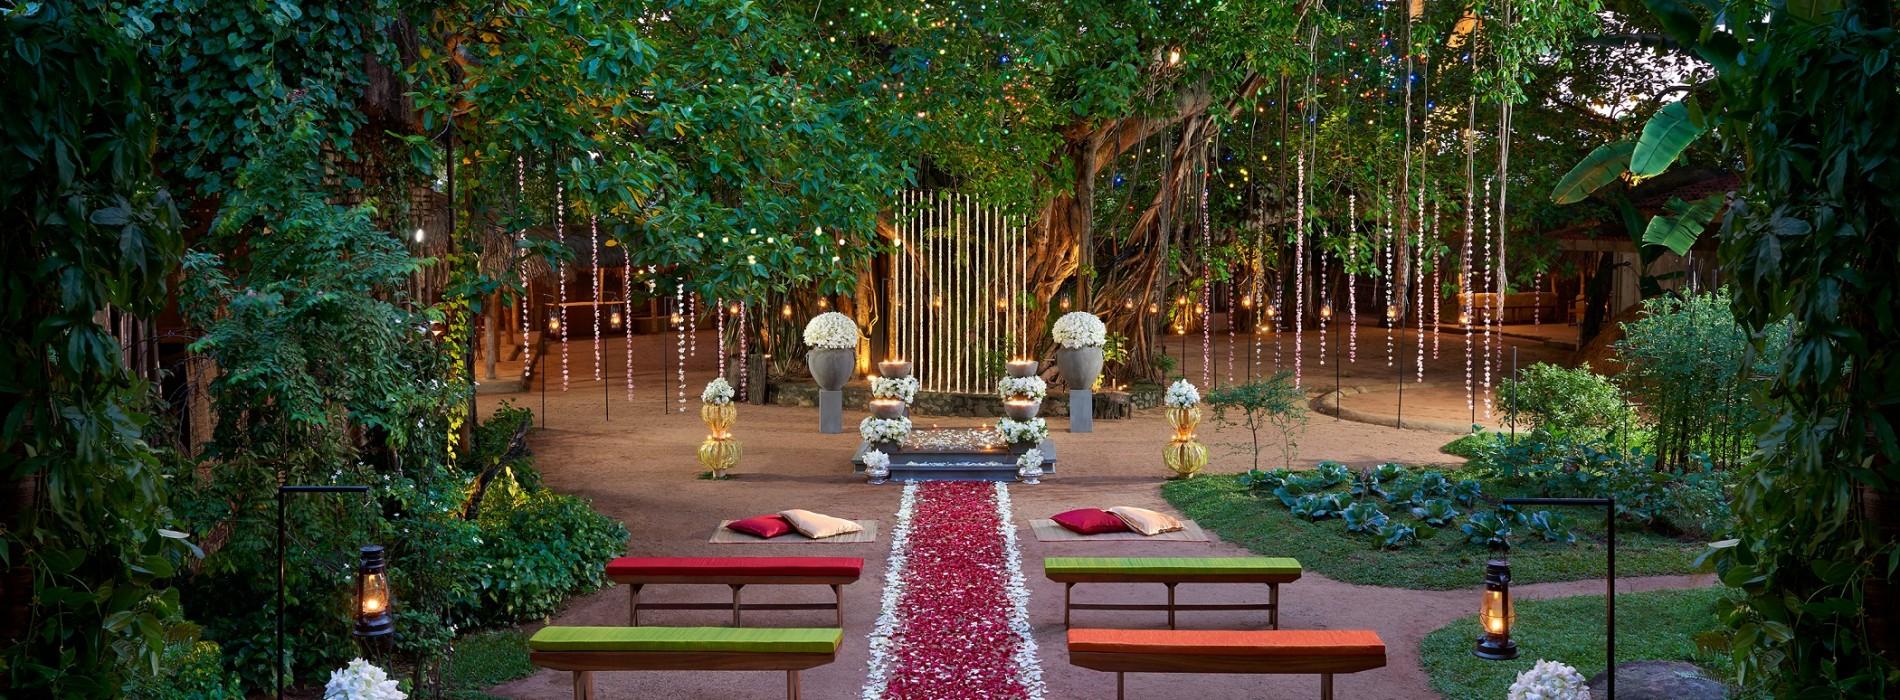 Cinnamon Hotels & Resorts in Sri Lanka organized a FAM trip for Indian wedding planners